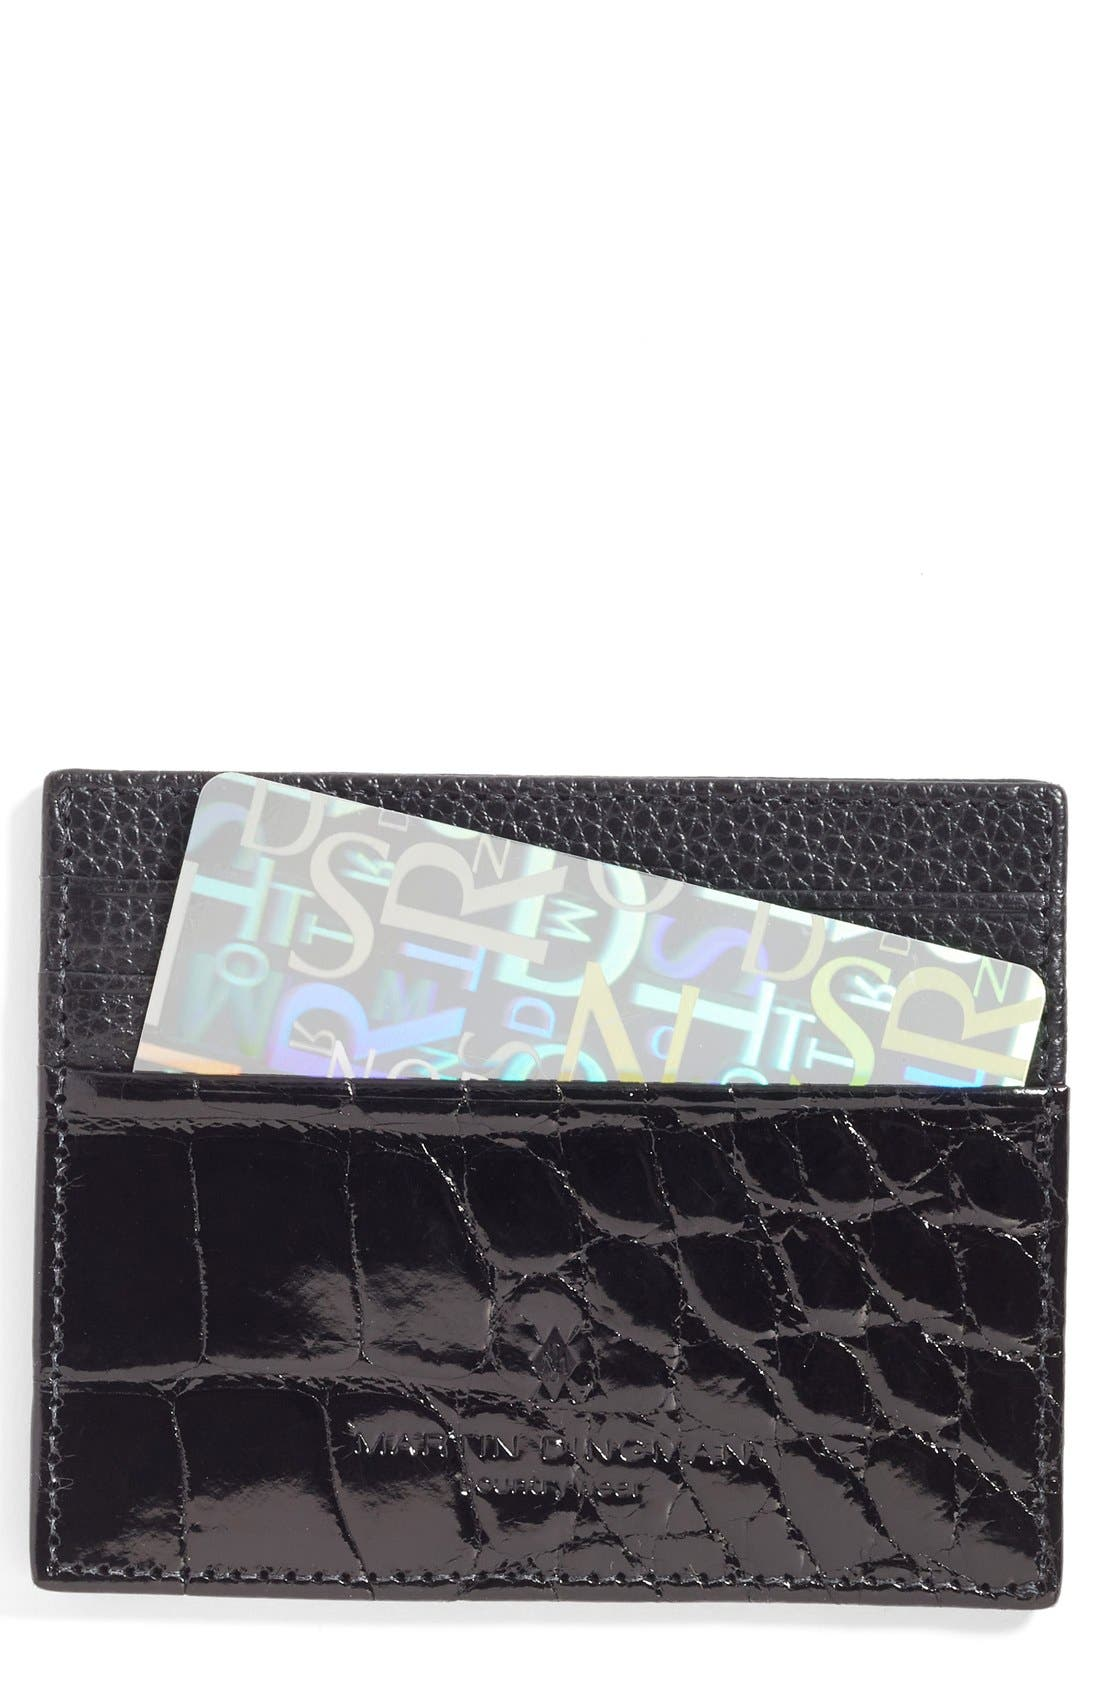 Executive Leather Card Case,                             Main thumbnail 1, color,